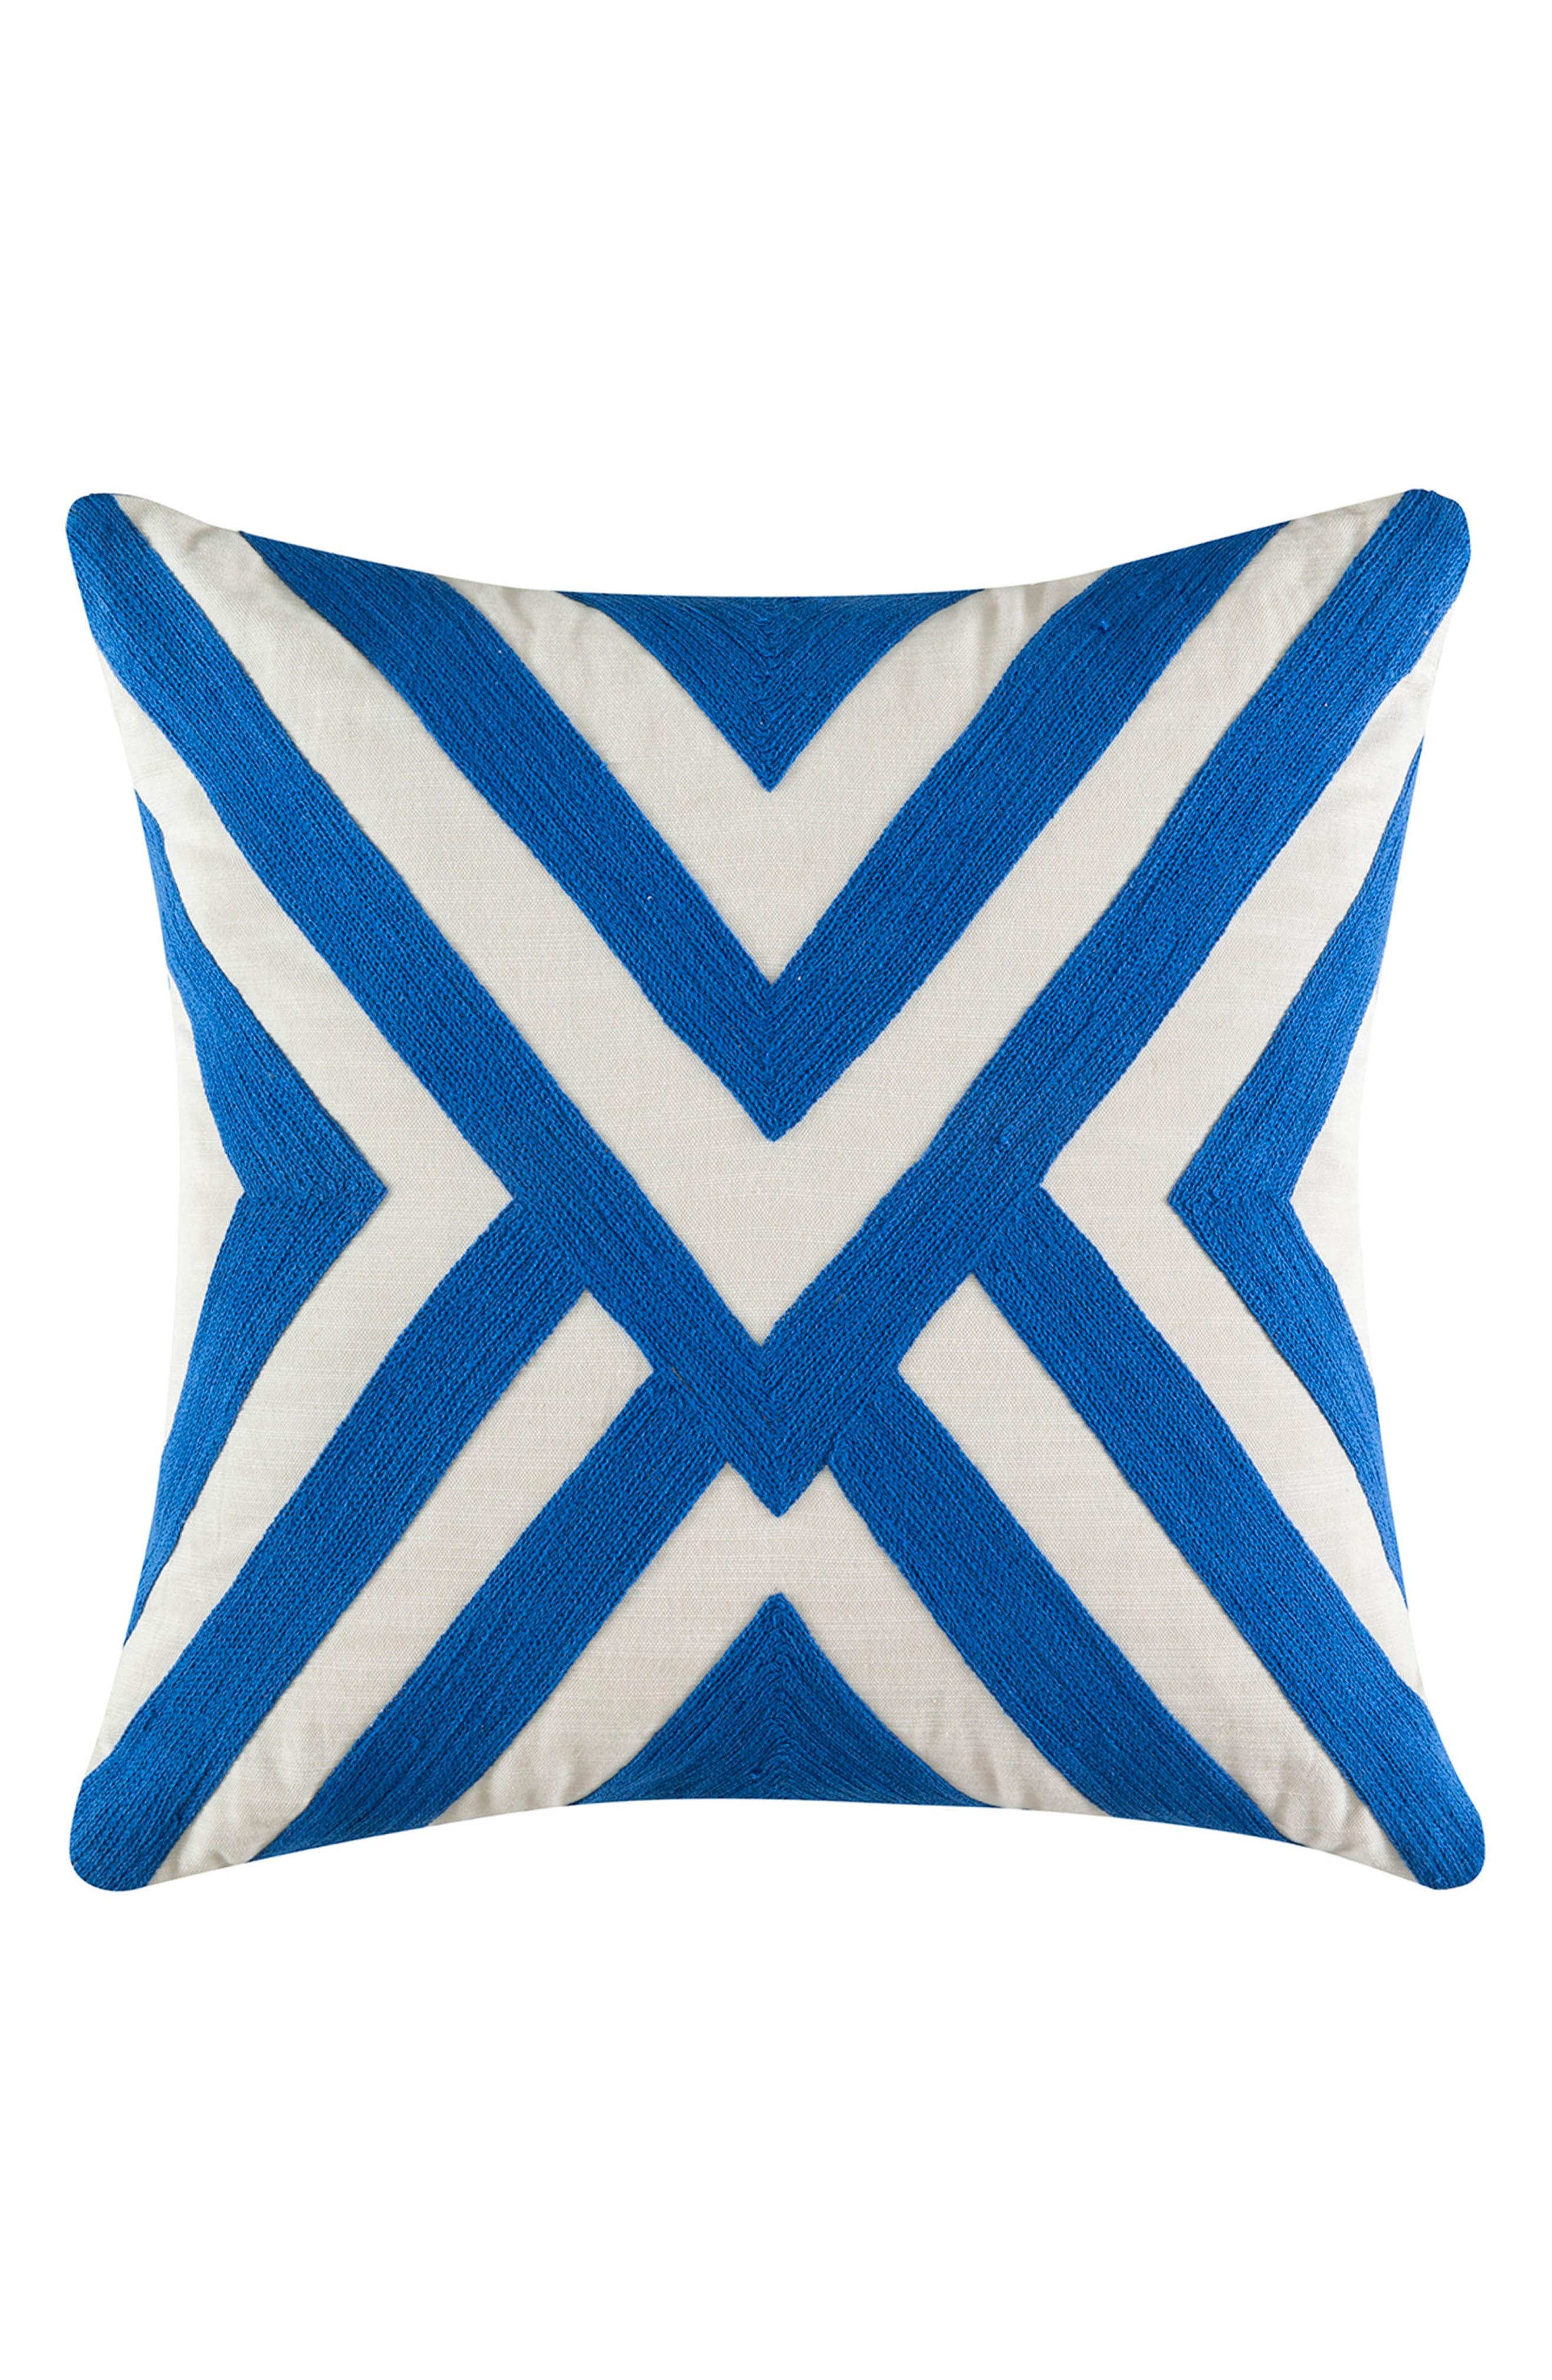 KAS Designs Riley Mindi Pillow